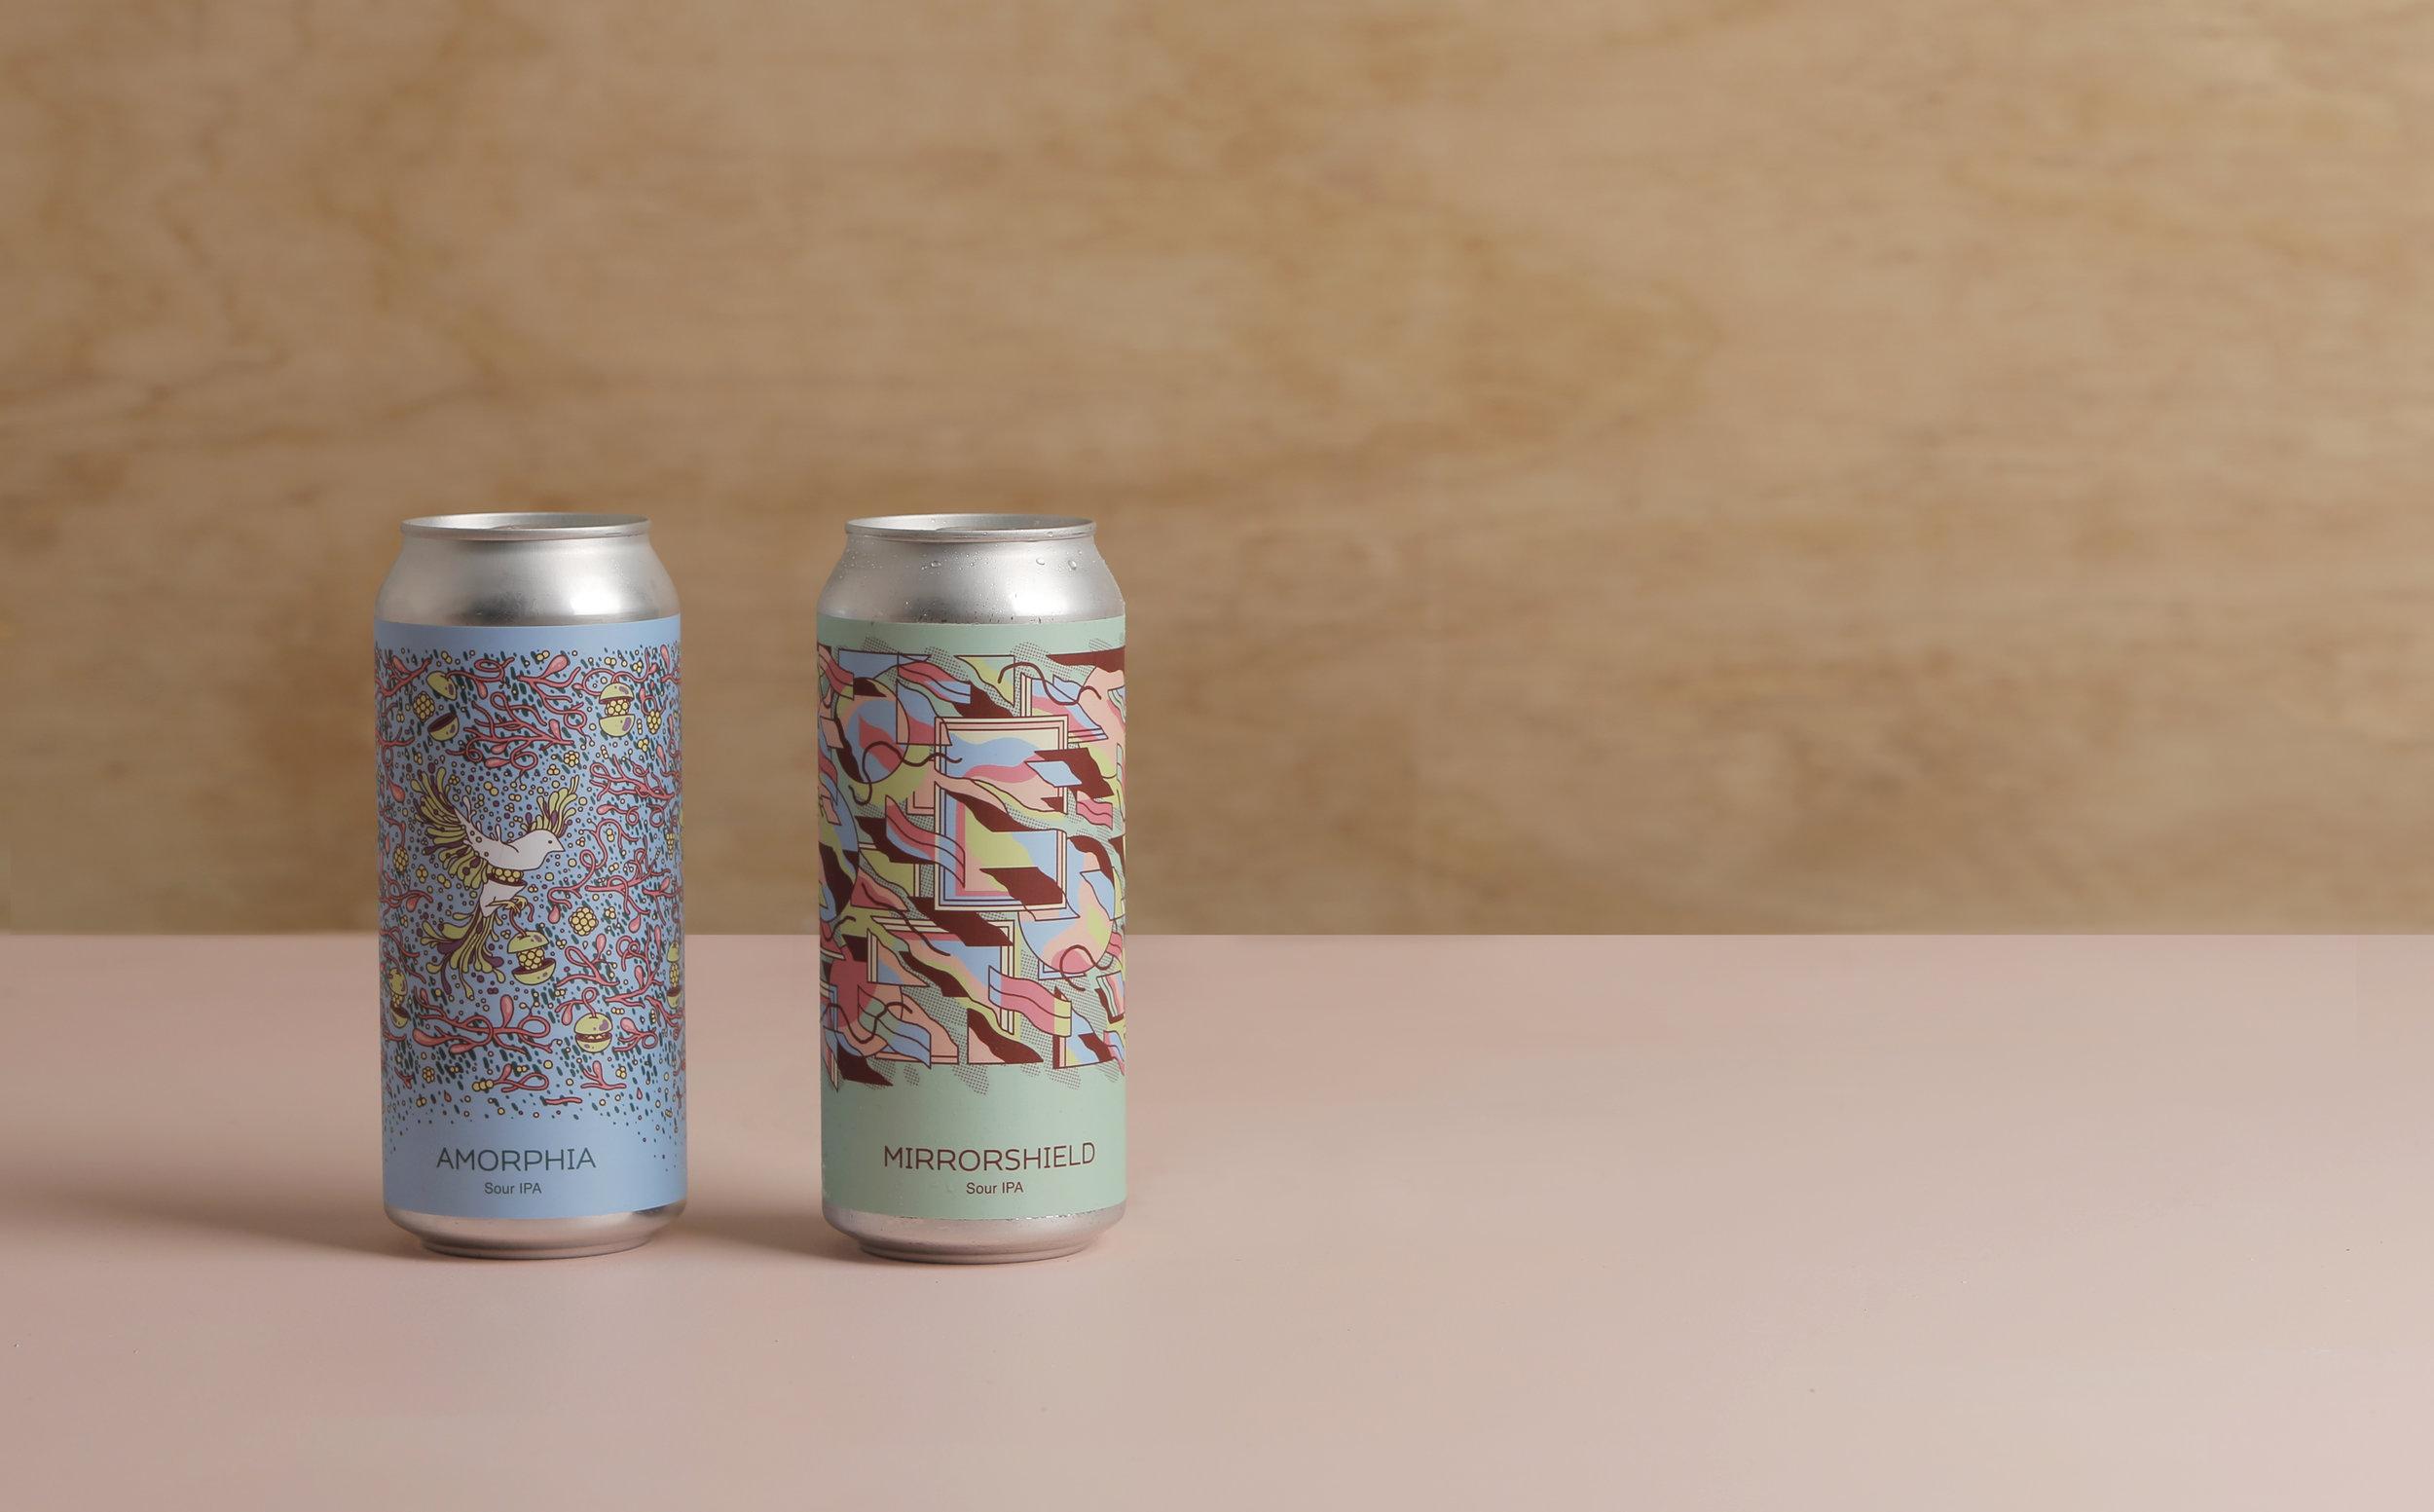 Amorphia and Mirrorshield cans